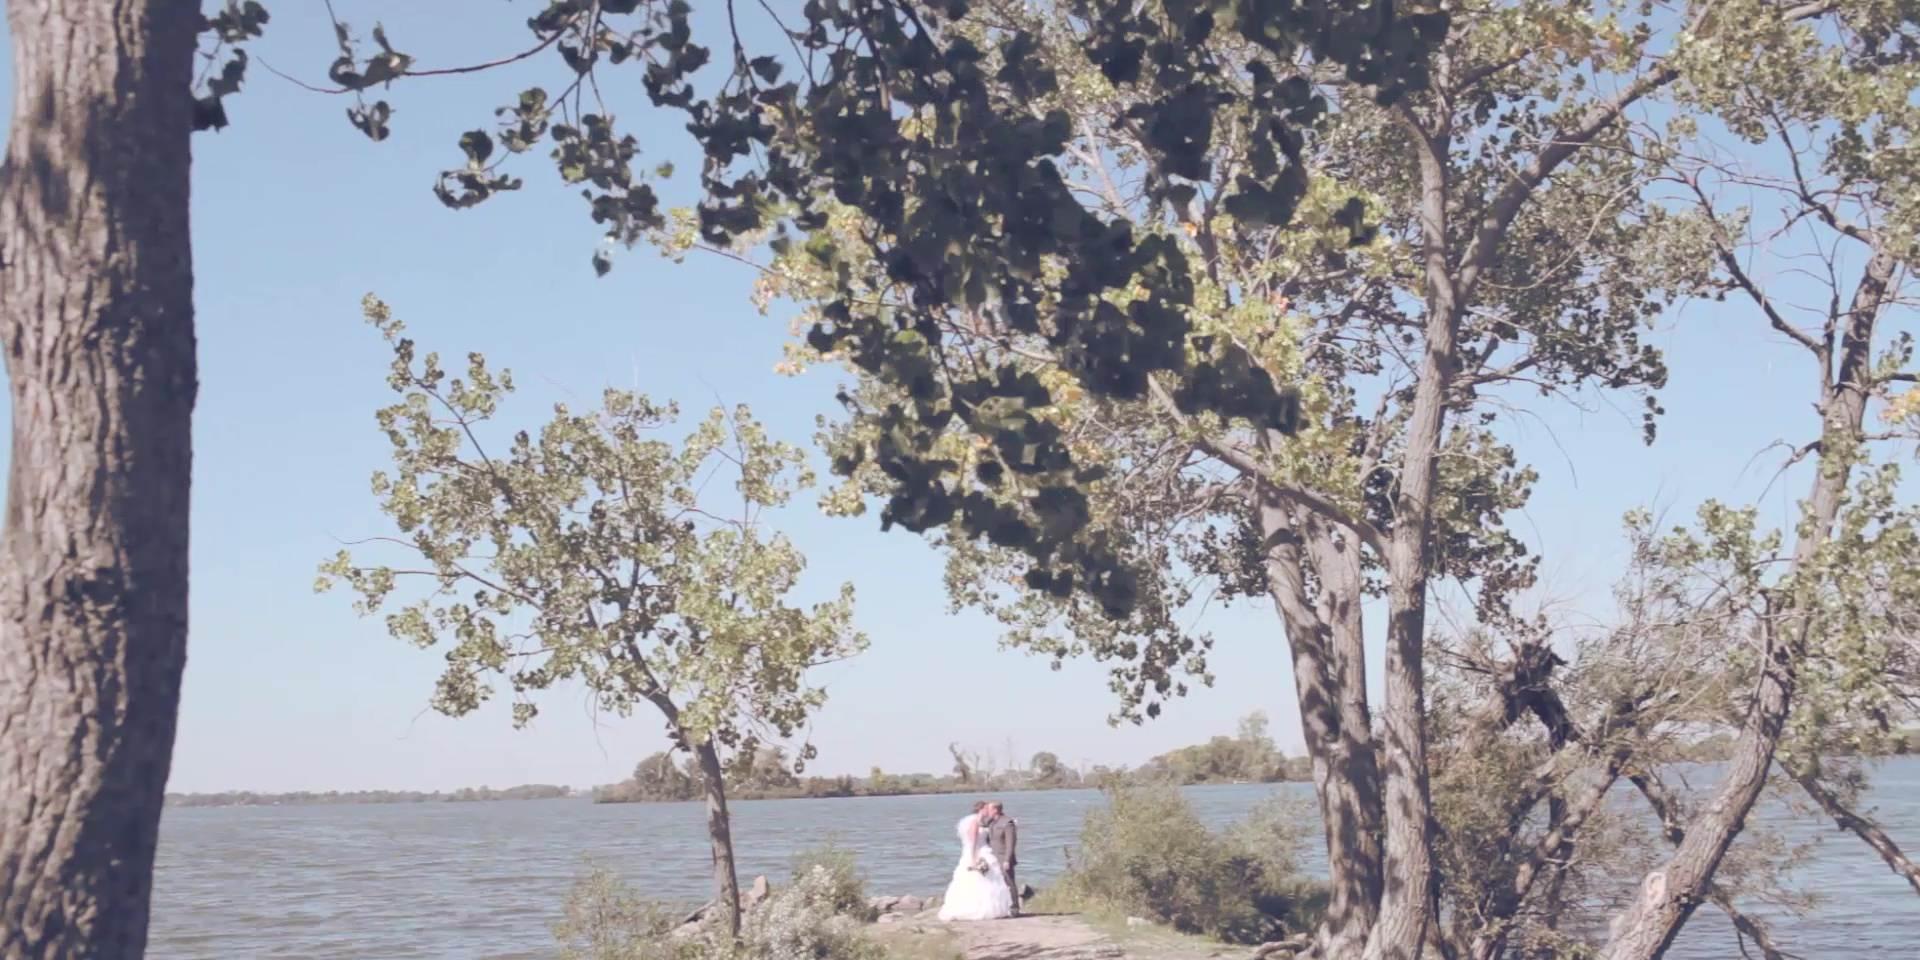 eric&lindsey wedding story.mp4-still00005.jpg